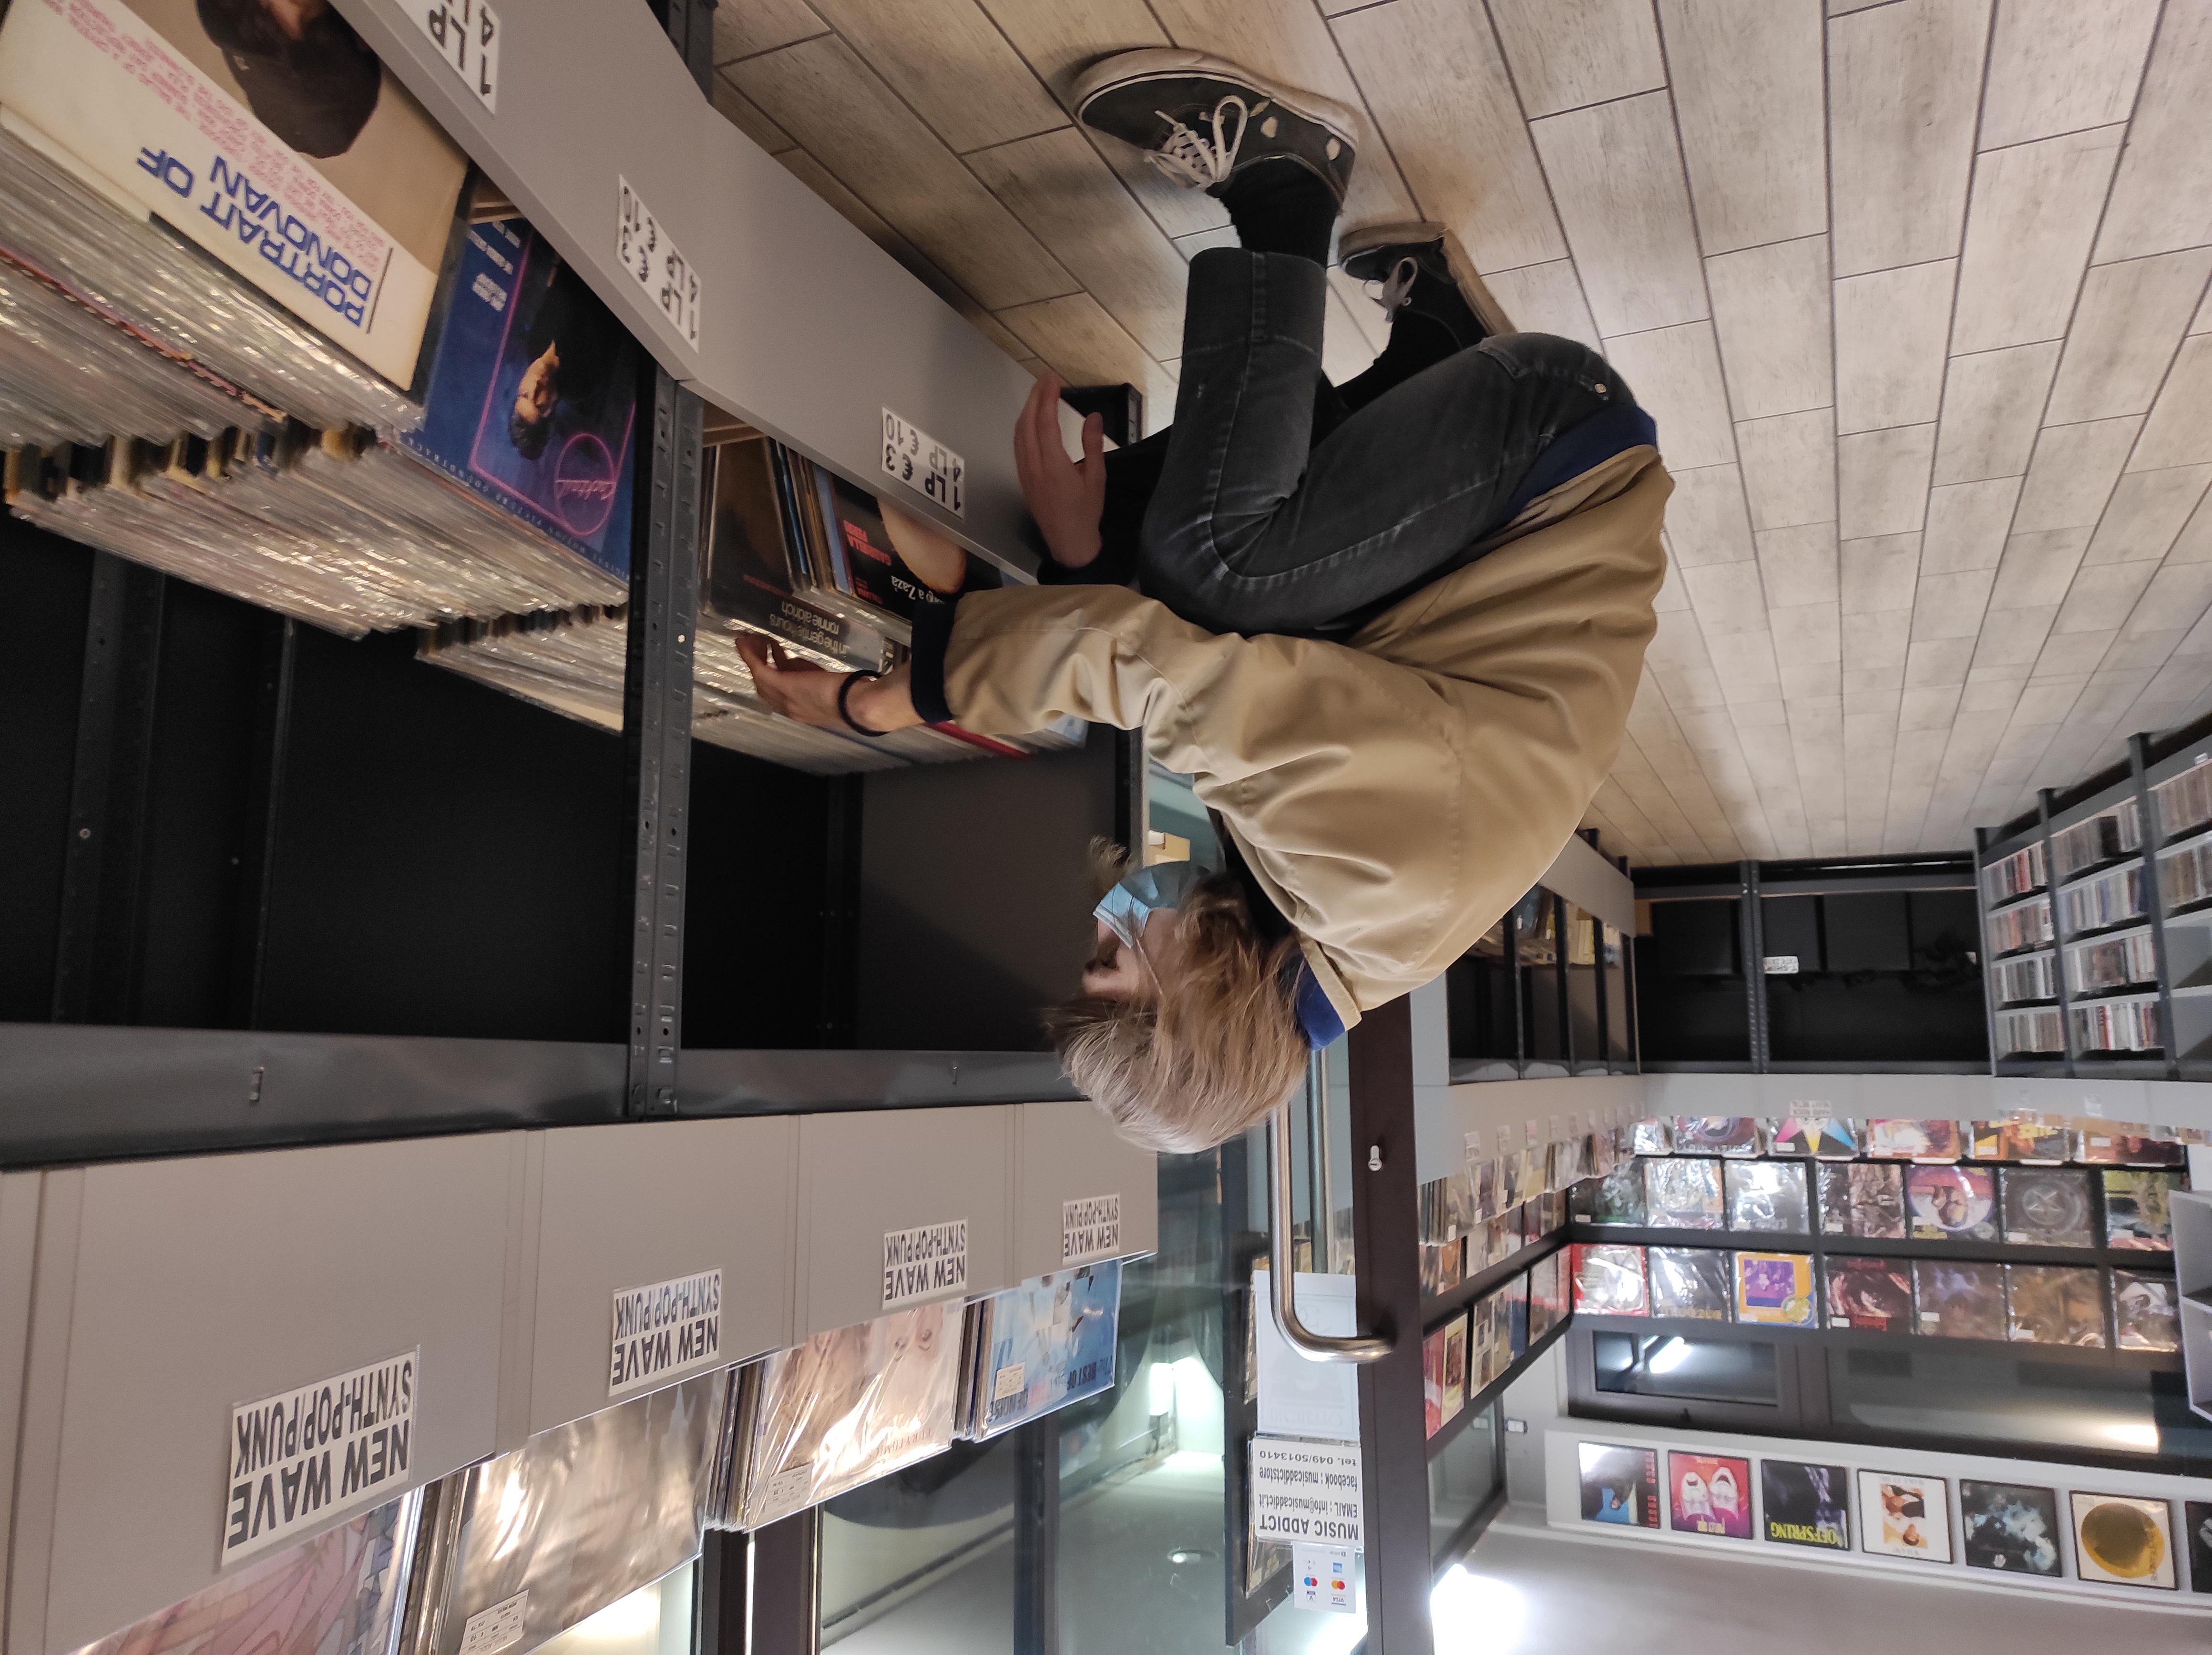 Carlo mentre fruga tra i dischi